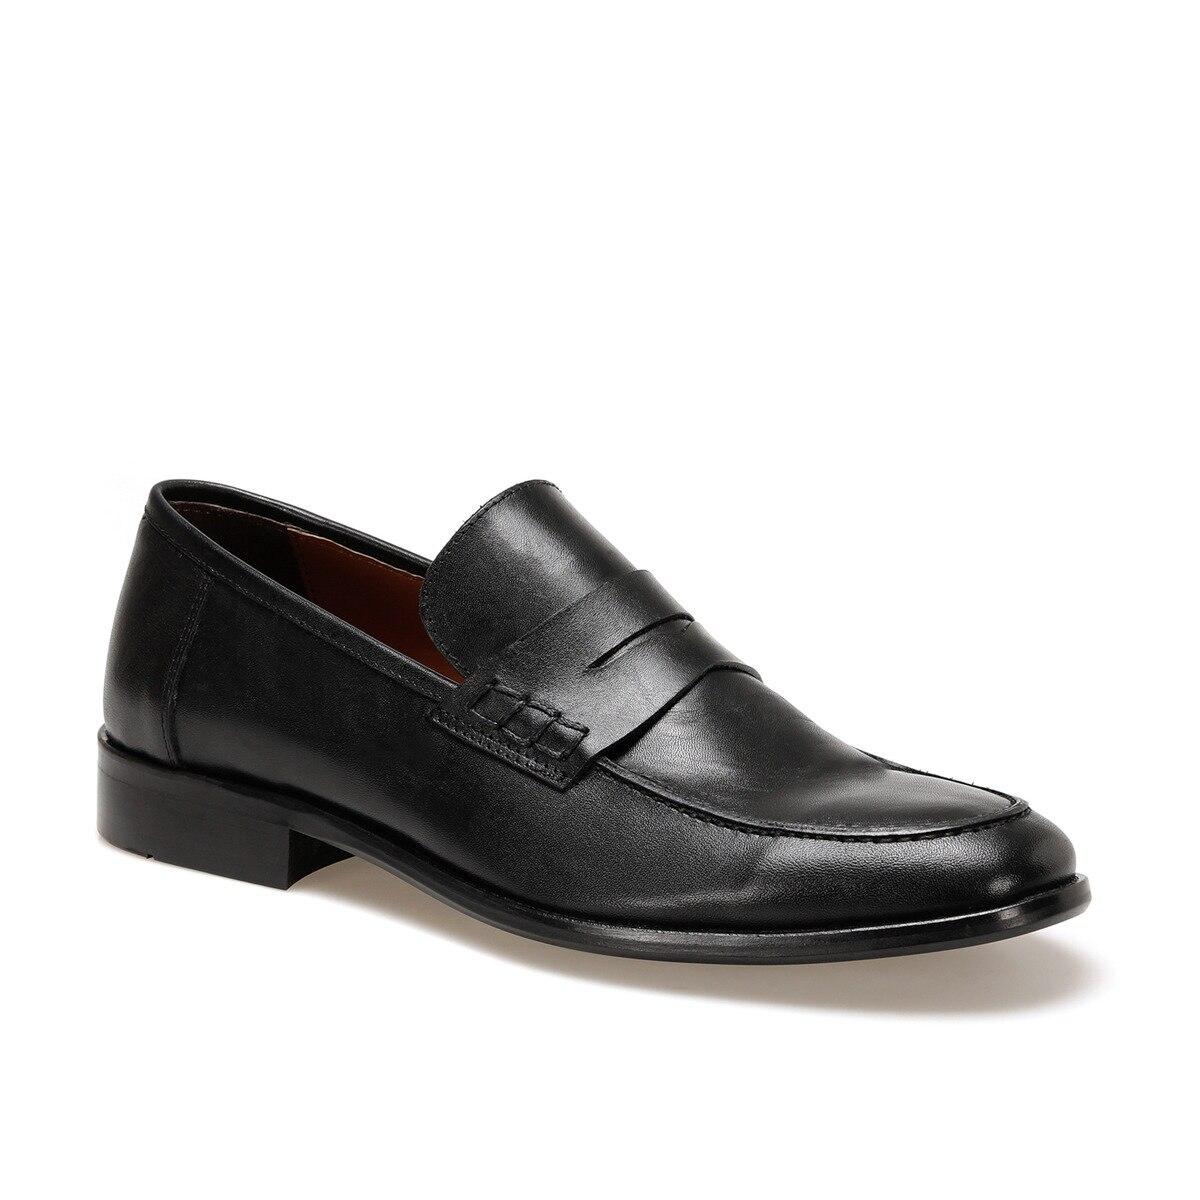 FLO Black Leather Men's Casual Shoes Mocassin men's sneakers Garamond 4247